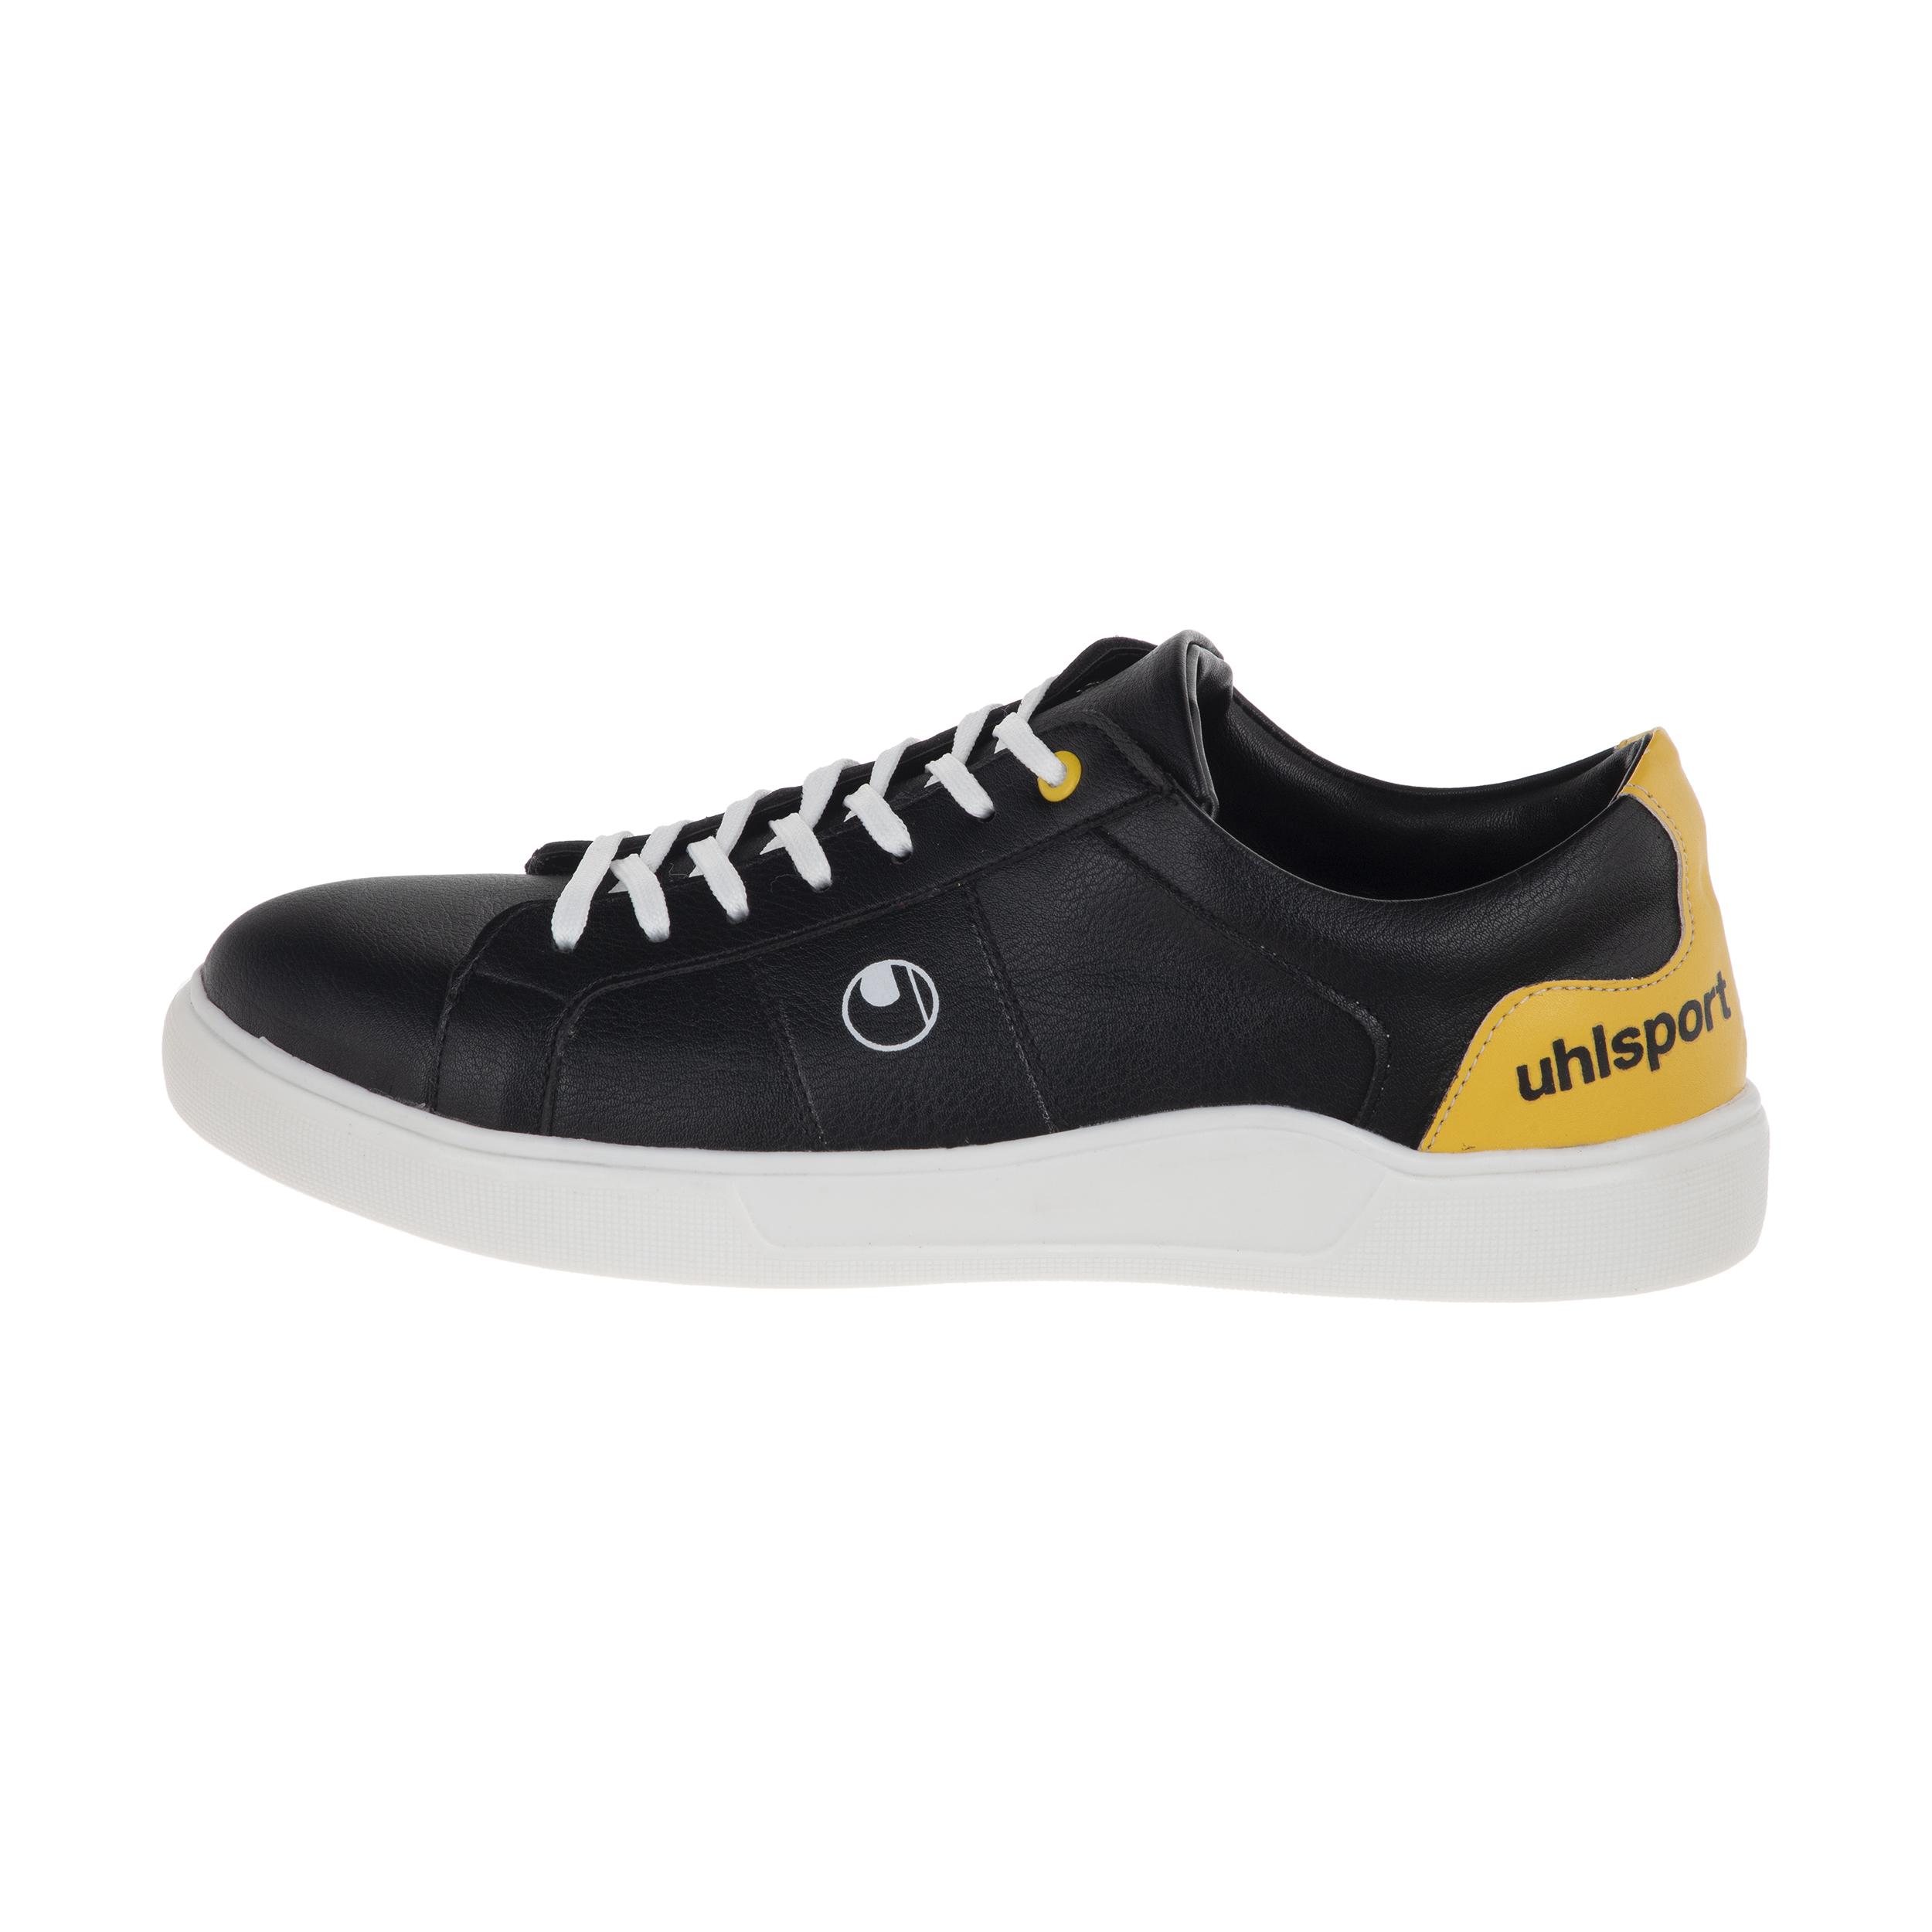 کفش مردانه آلشپرت کد MUH584-001